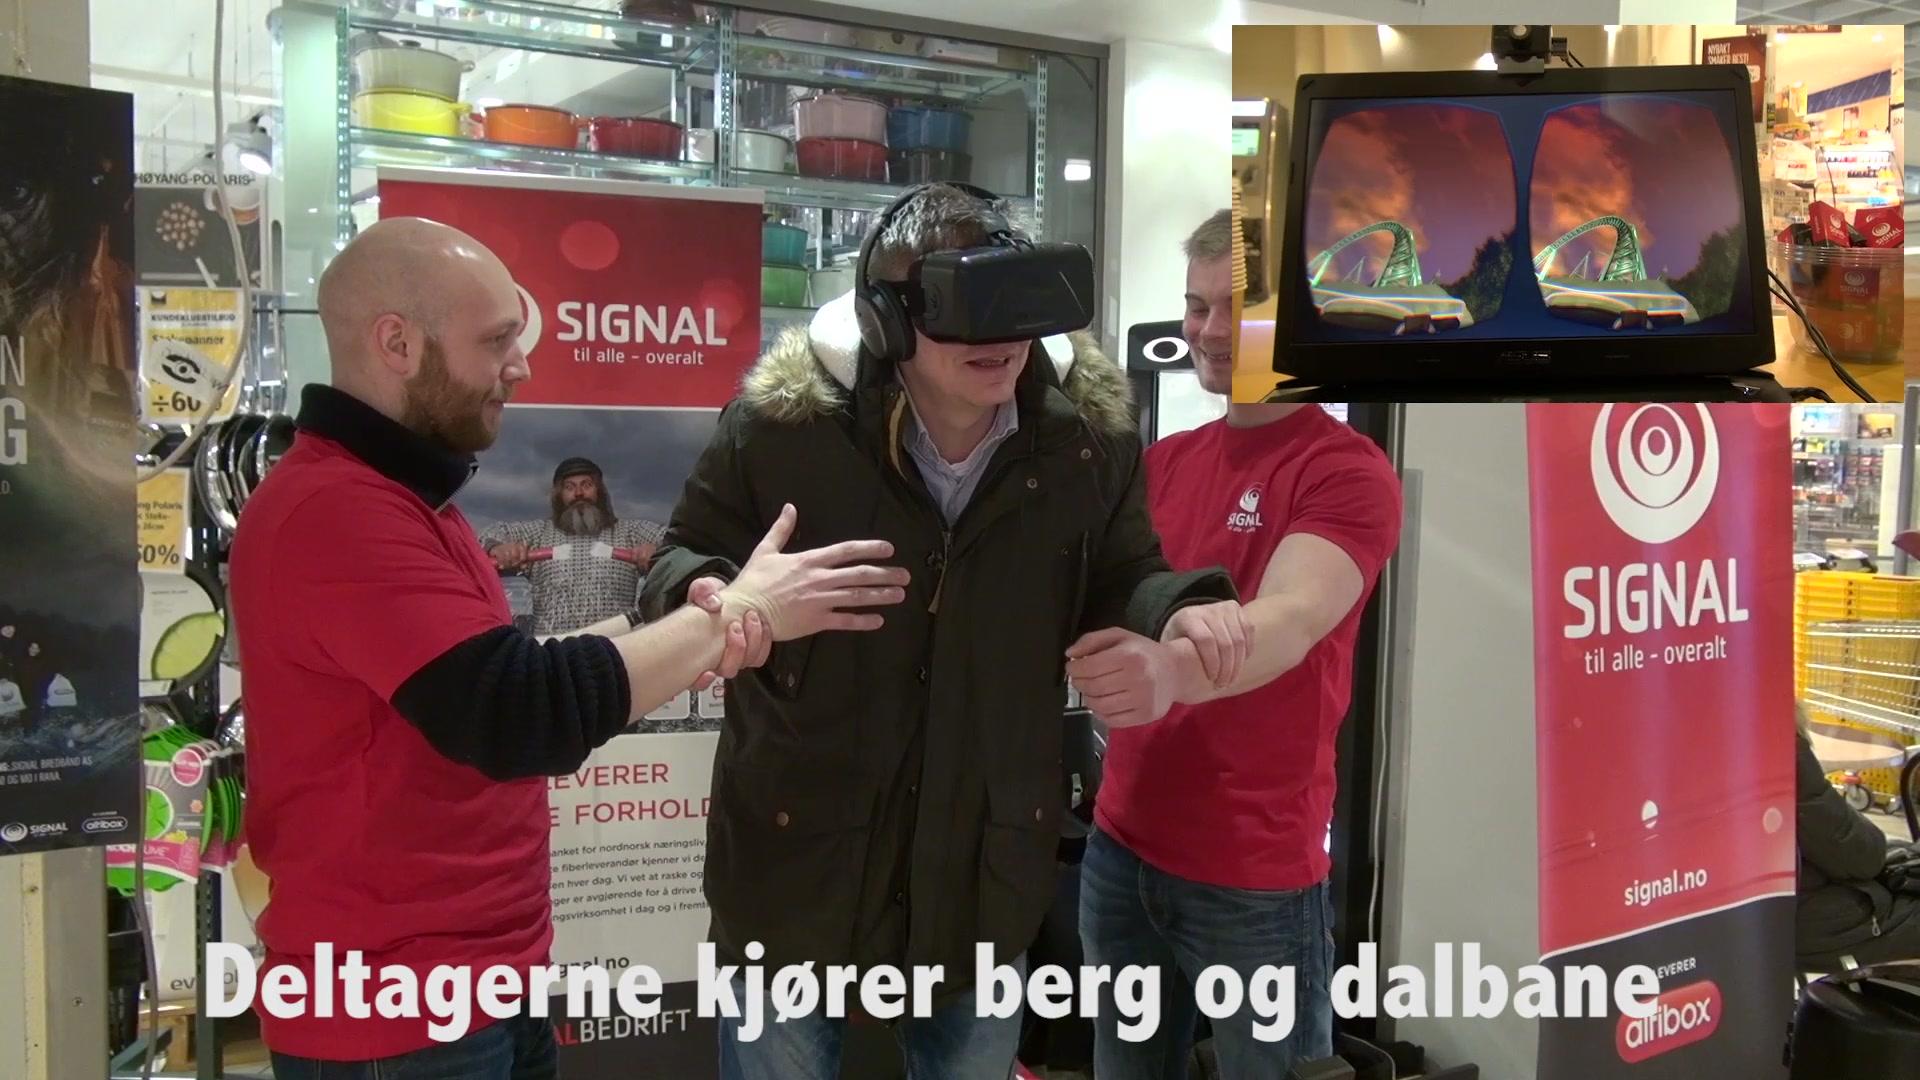 Tester Virituel-brille